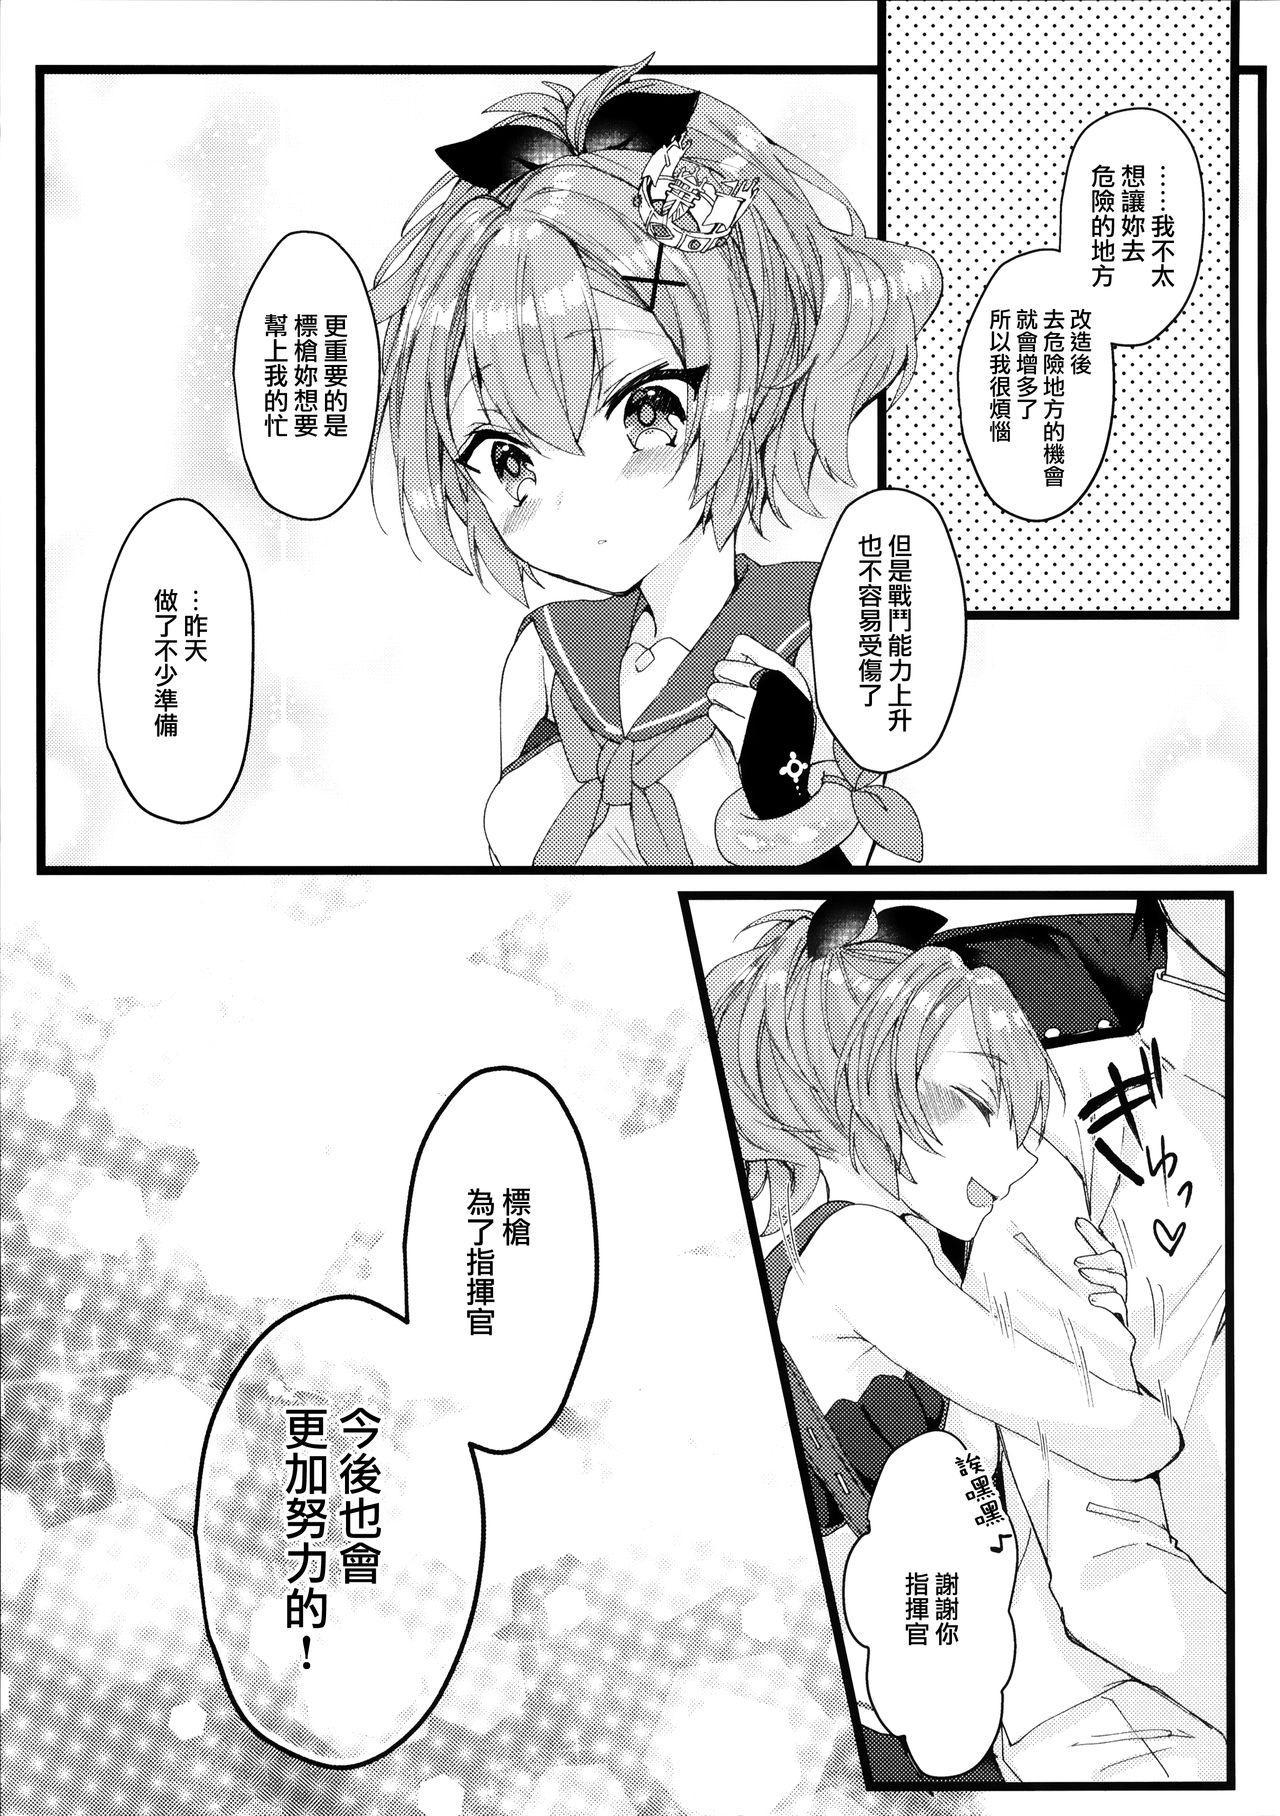 Javelin-chan to Kaizou Kunren 22